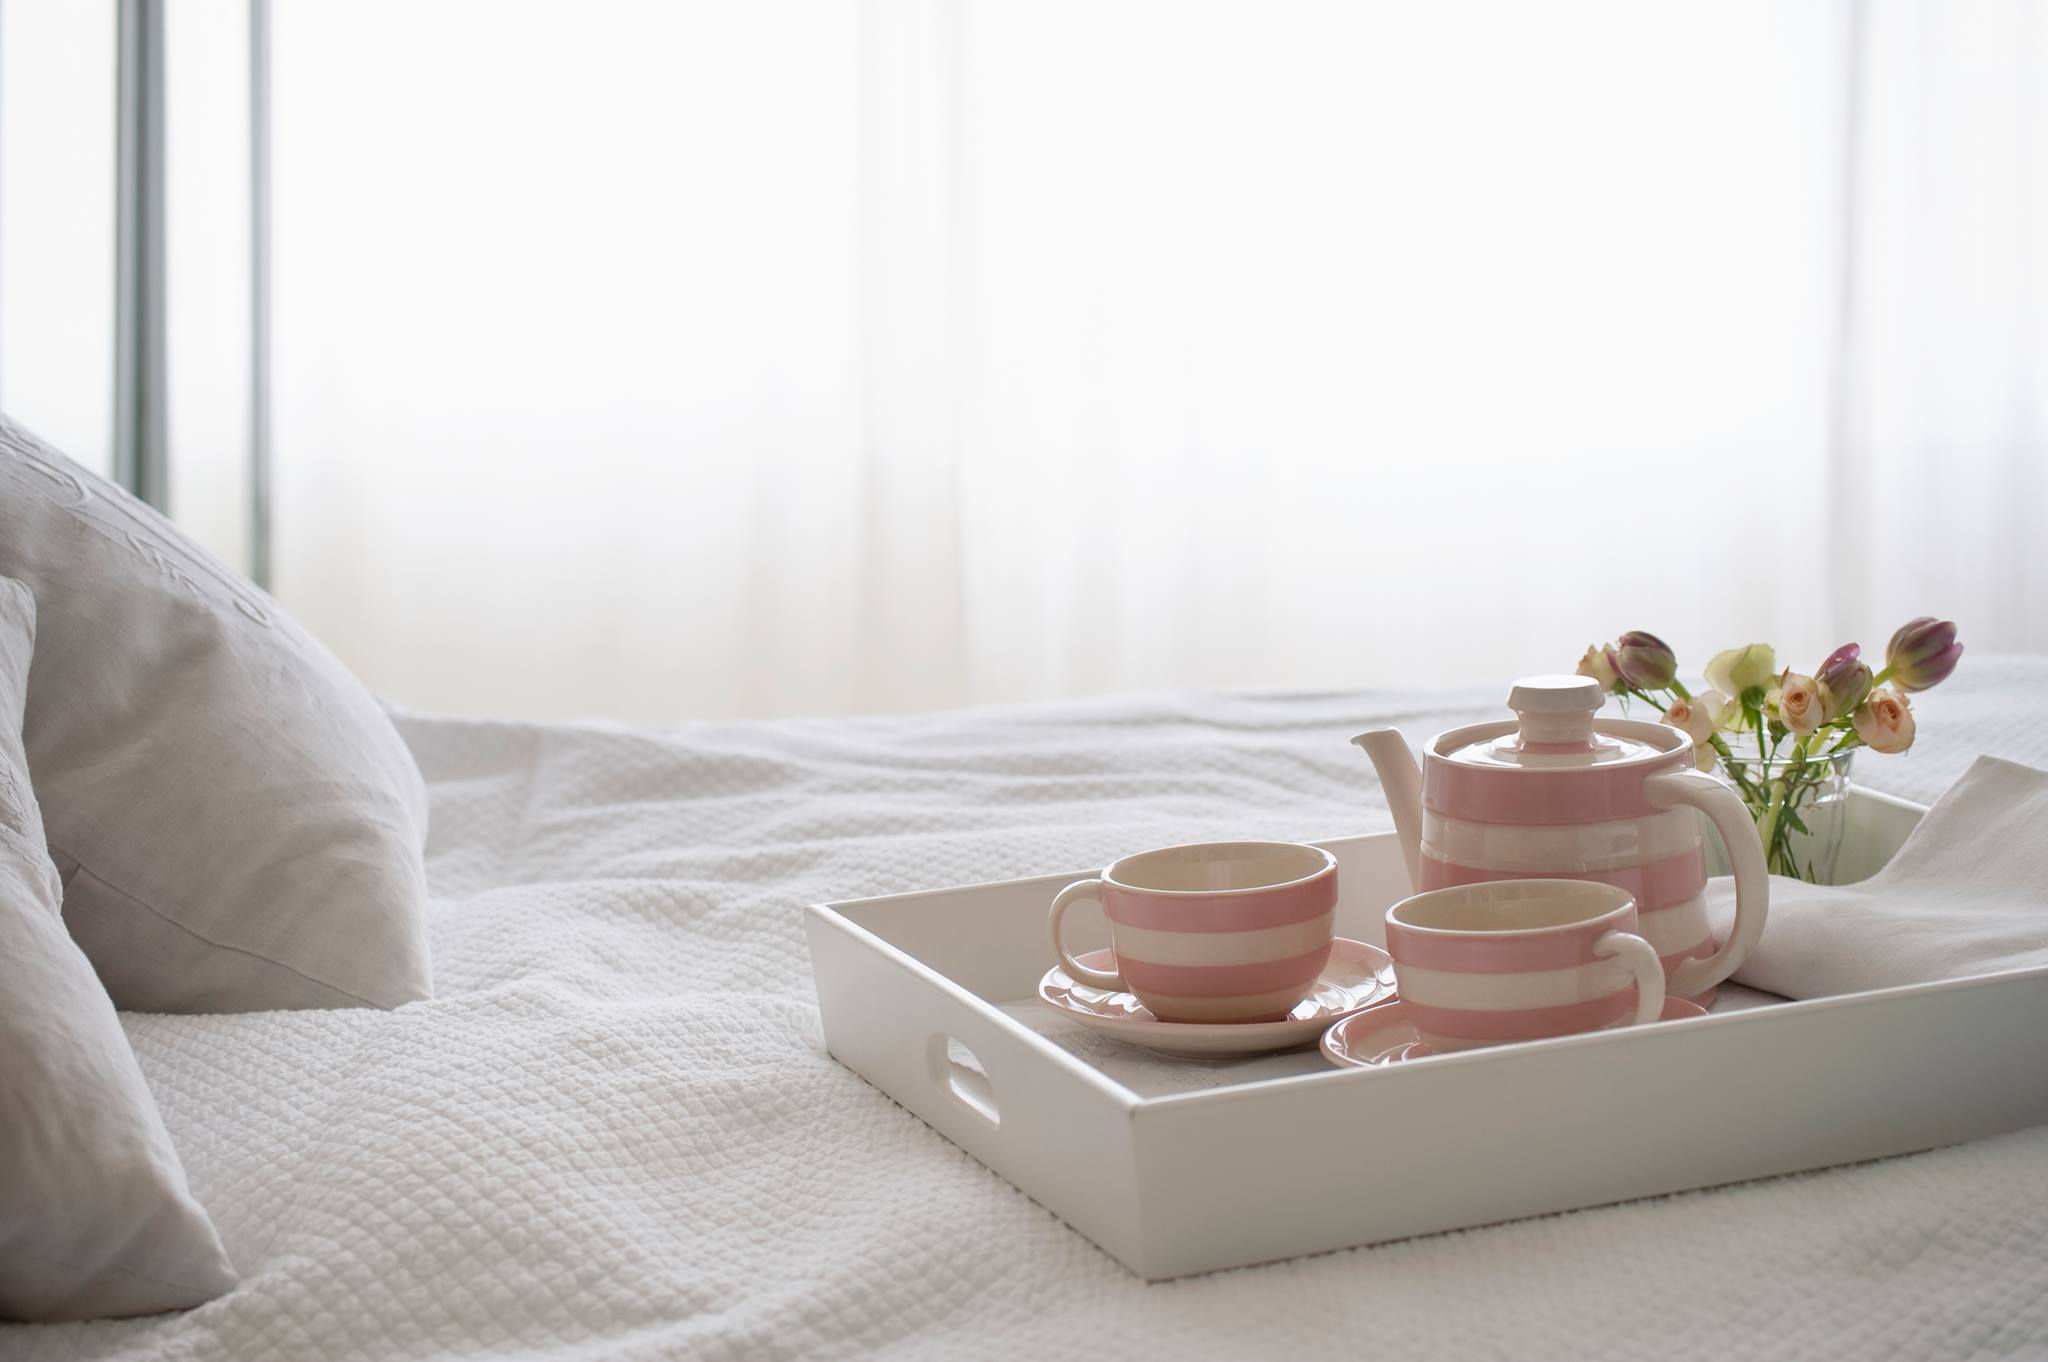 Best Airbnb Hosting Tips - Padlifter